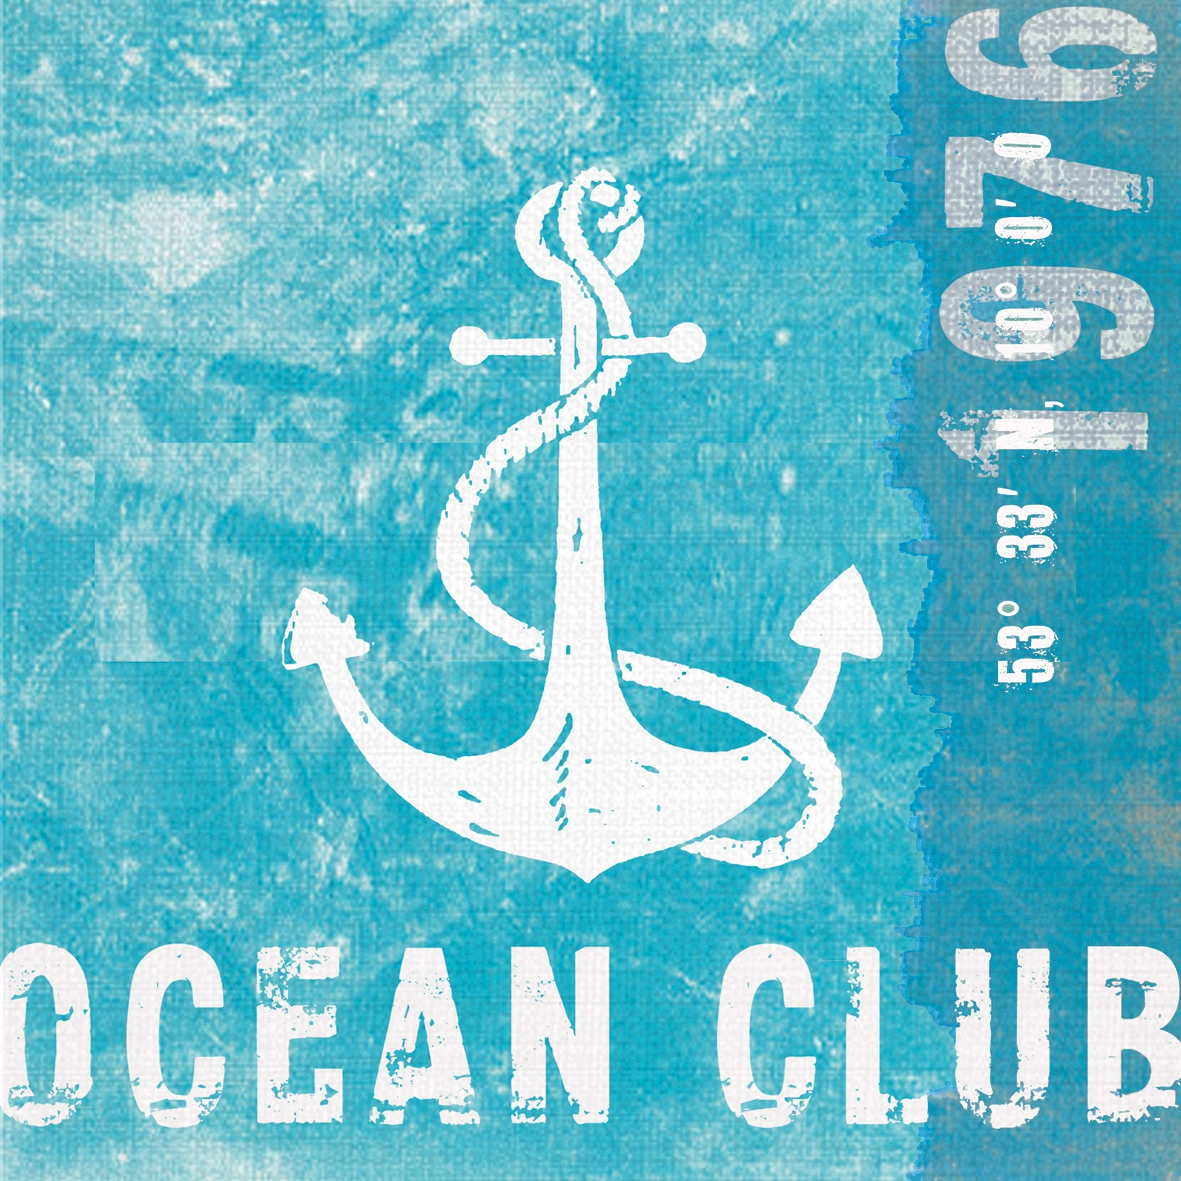 Lunch Servietten Ocean Club,  Sonstiges - Schriften,  Regionen - Strand / Meer -  Sonstige,  Everyday,  lunchservietten,  Schriften,  Anker